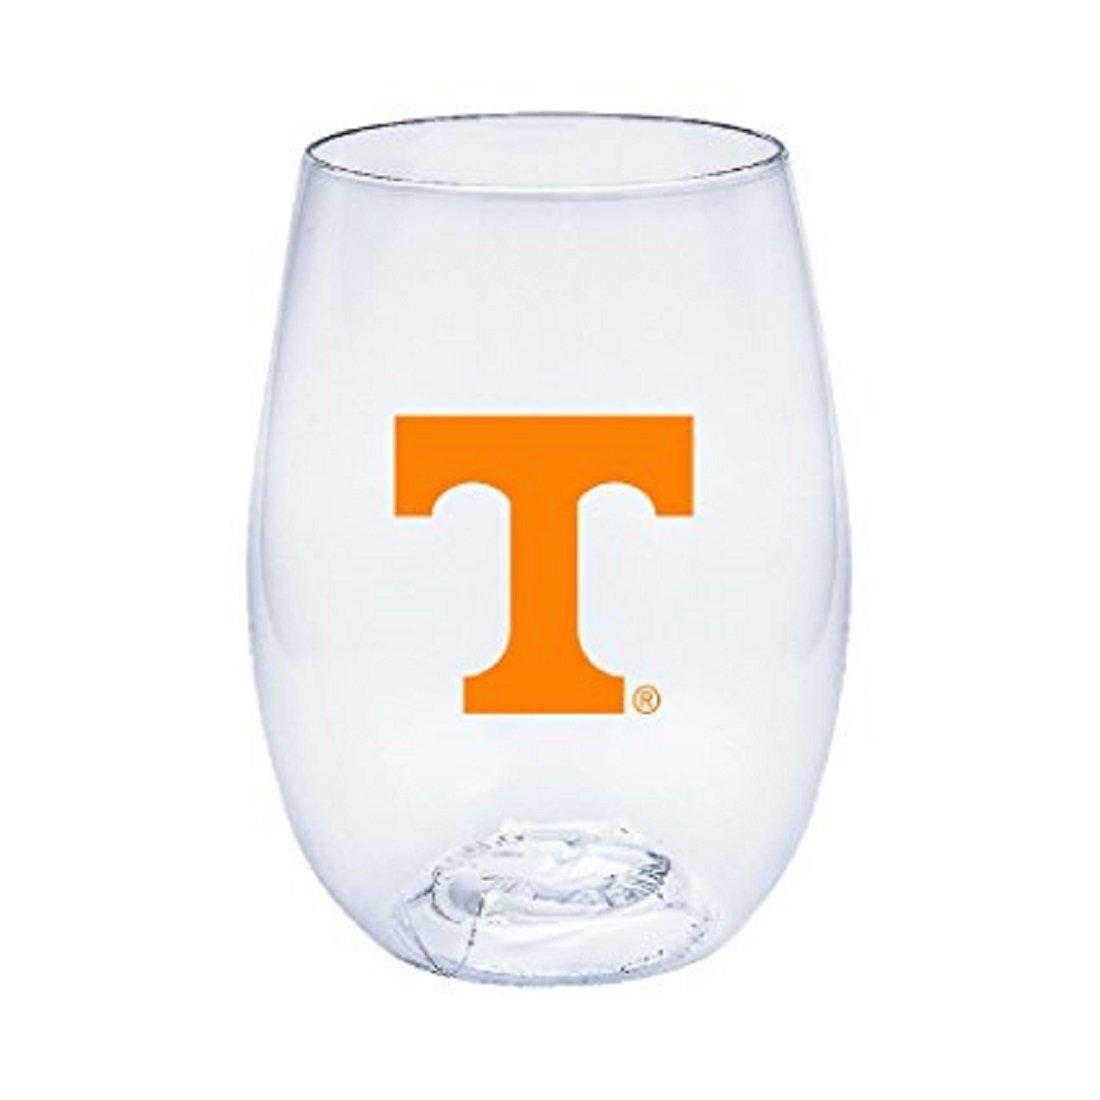 Neil Varsity Tennessee Volunteers Govino Shatterproof Wine or Beverage Glass